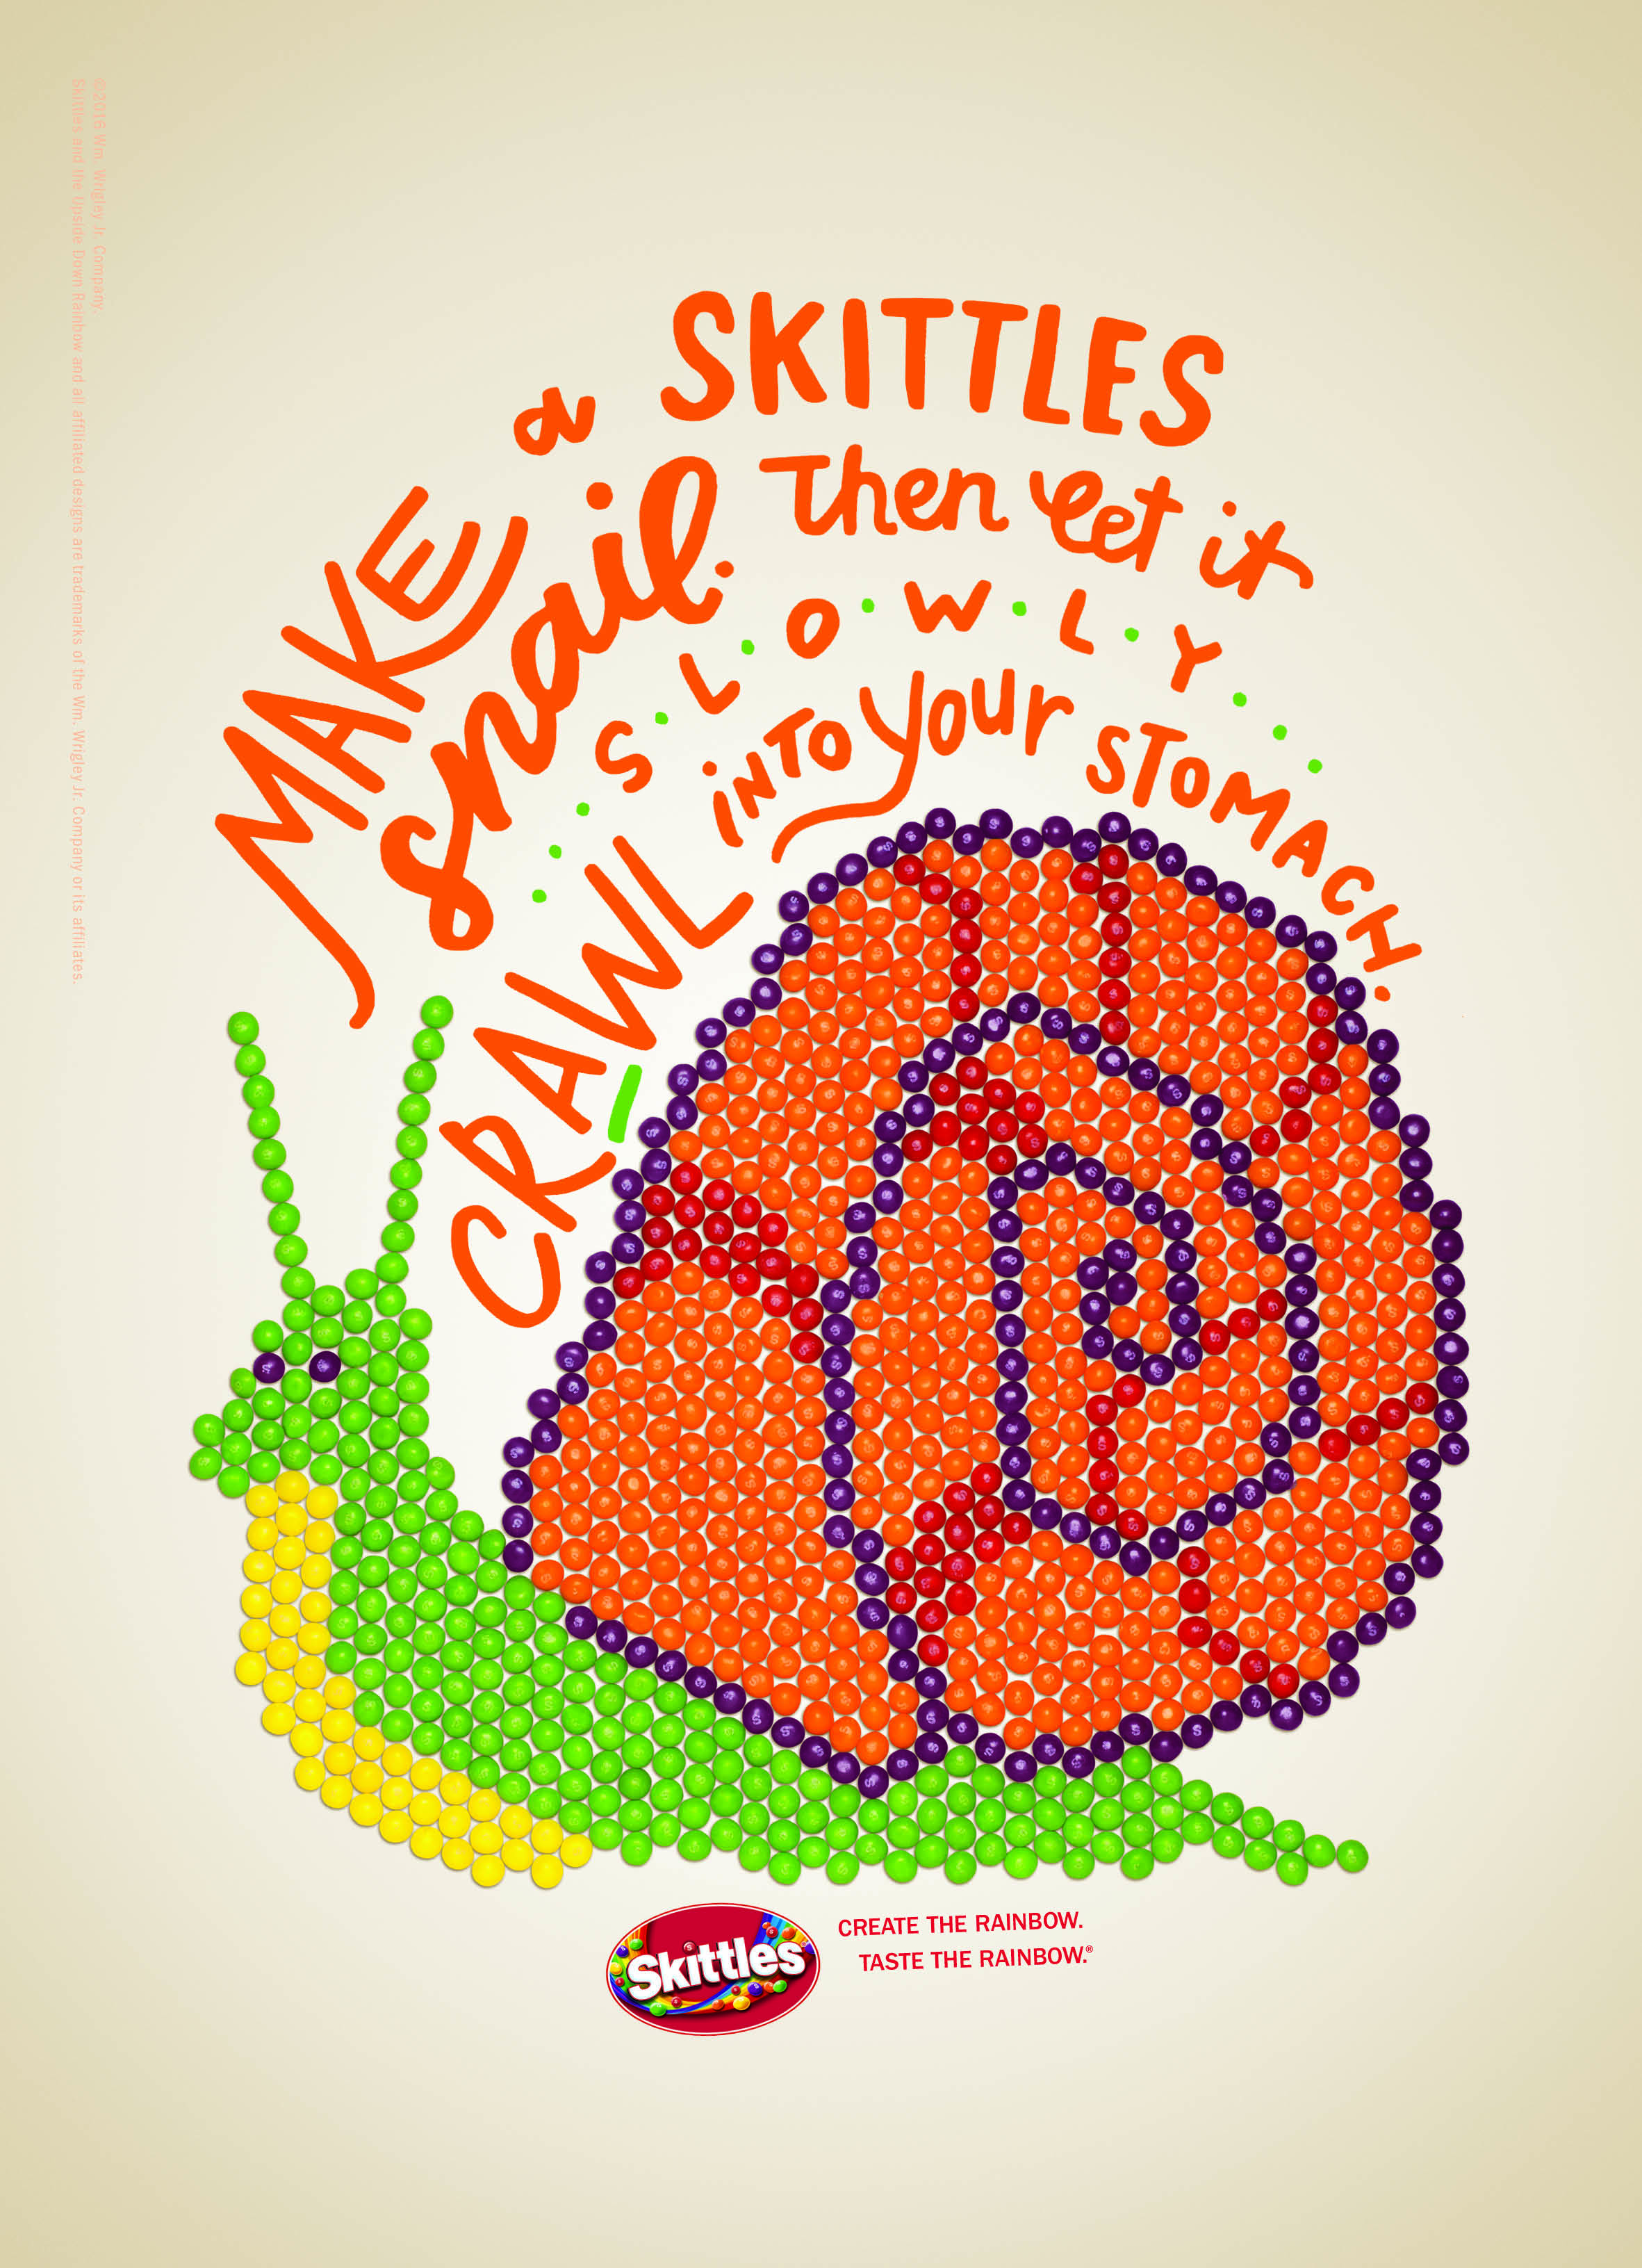 advertisement, skittles client, hand lettering